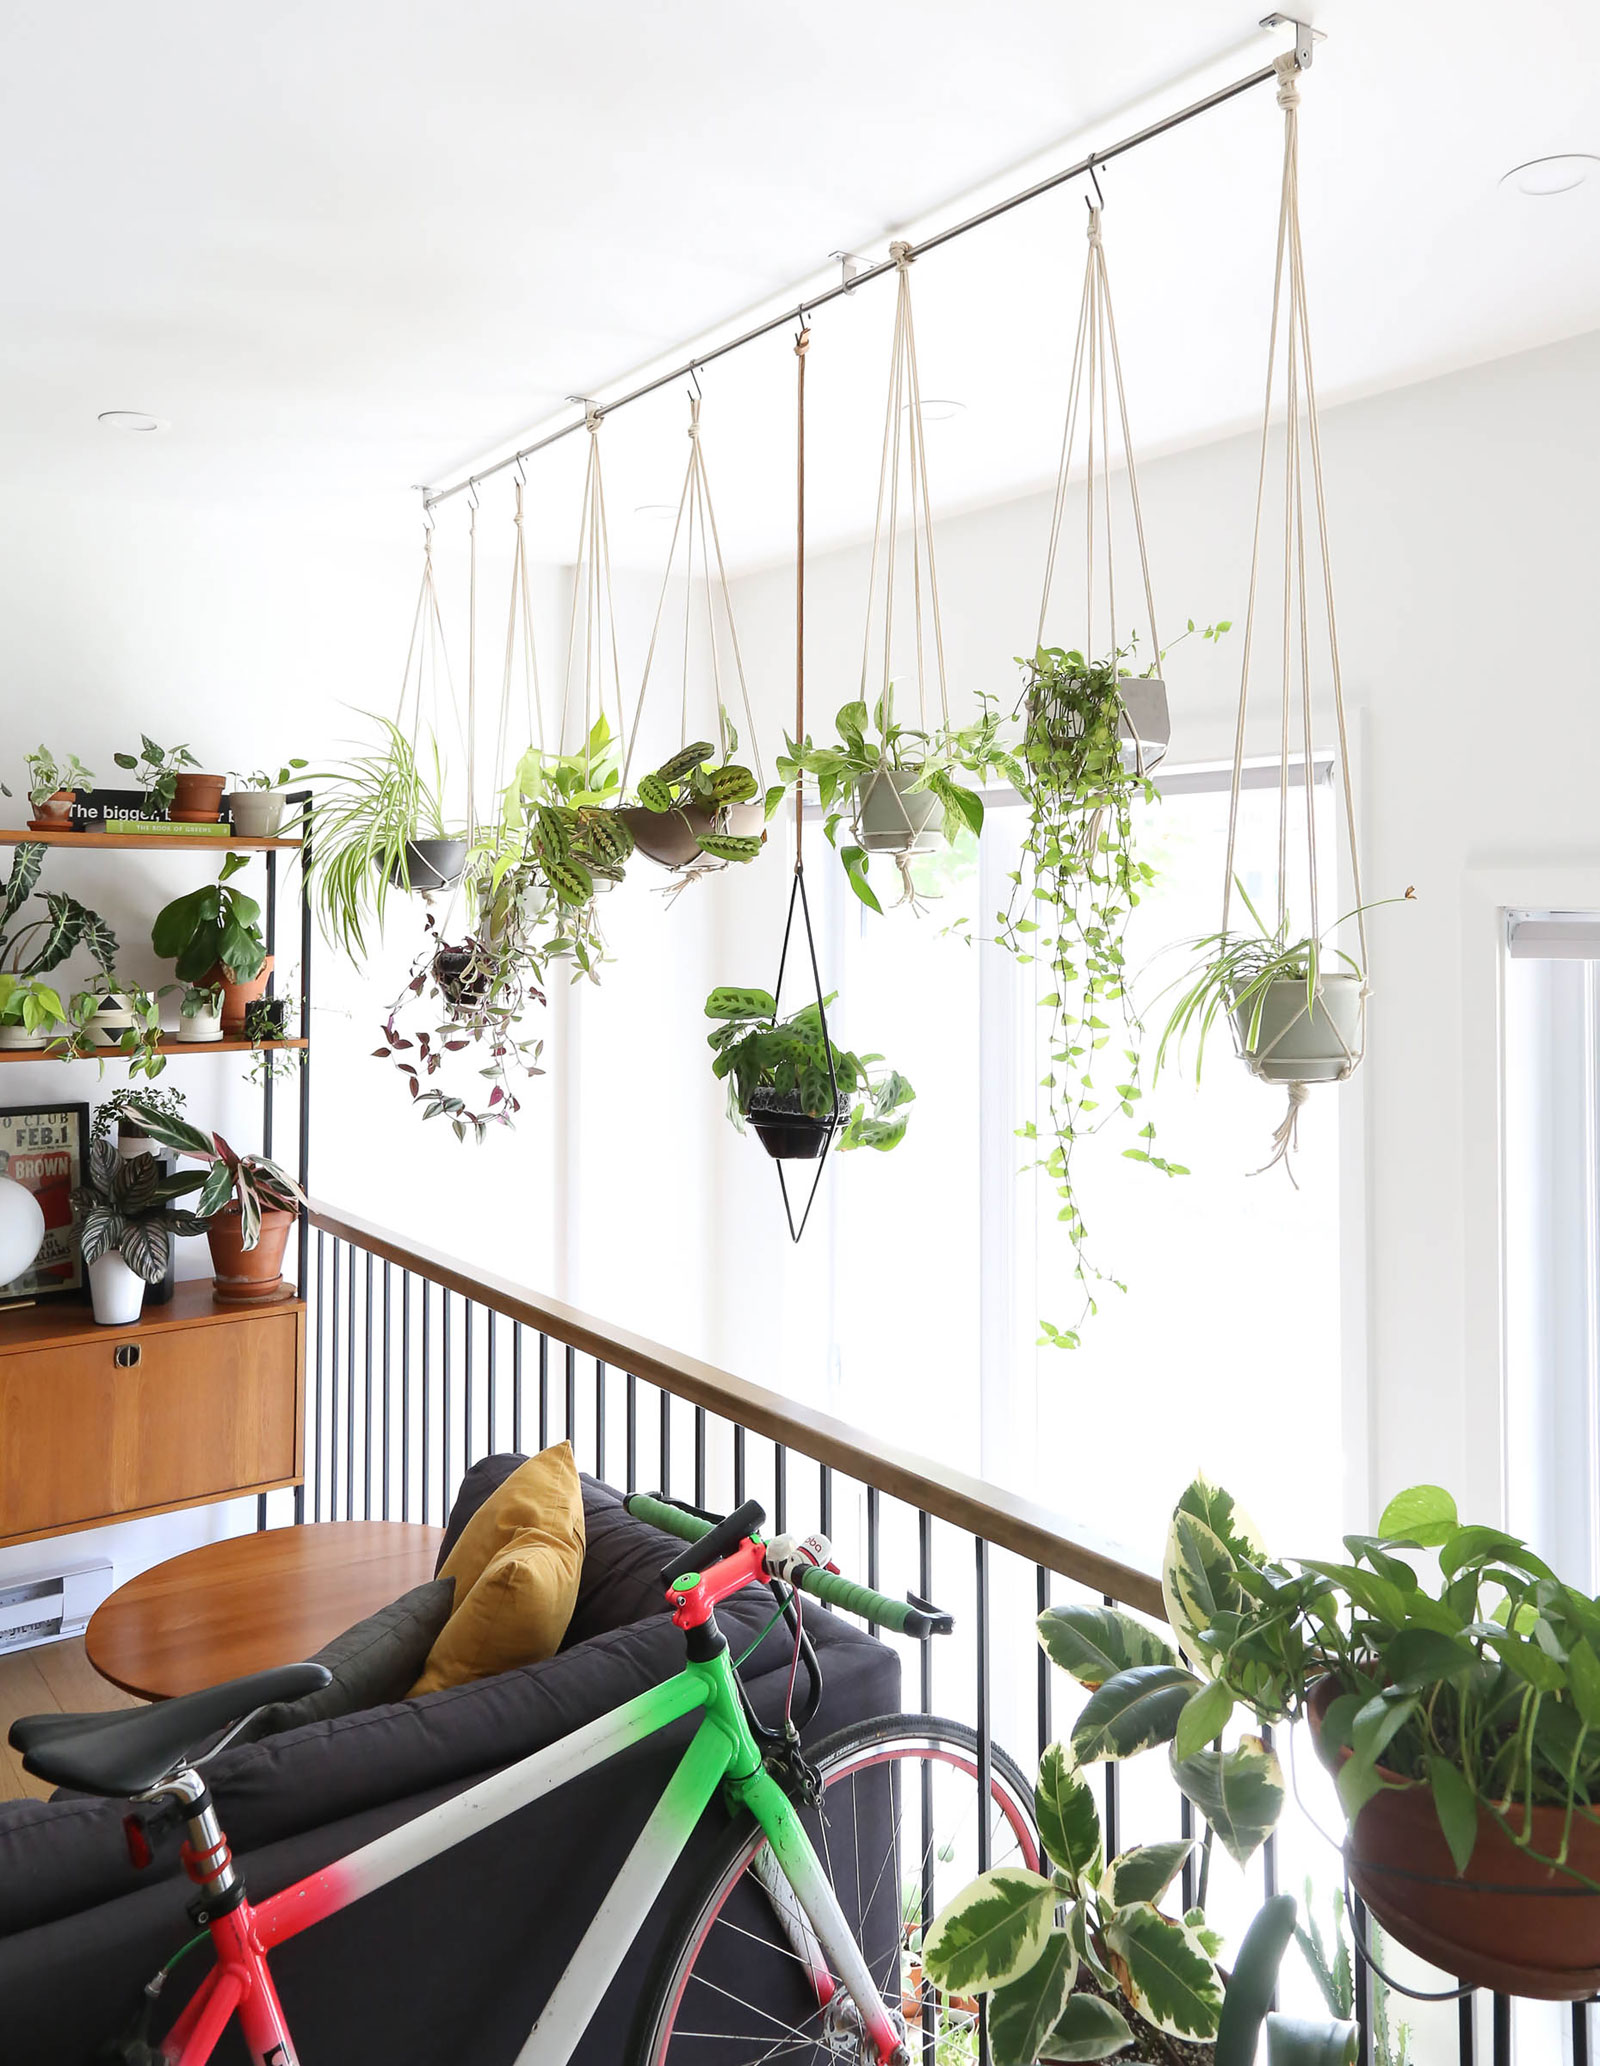 Interior full of indoor plants